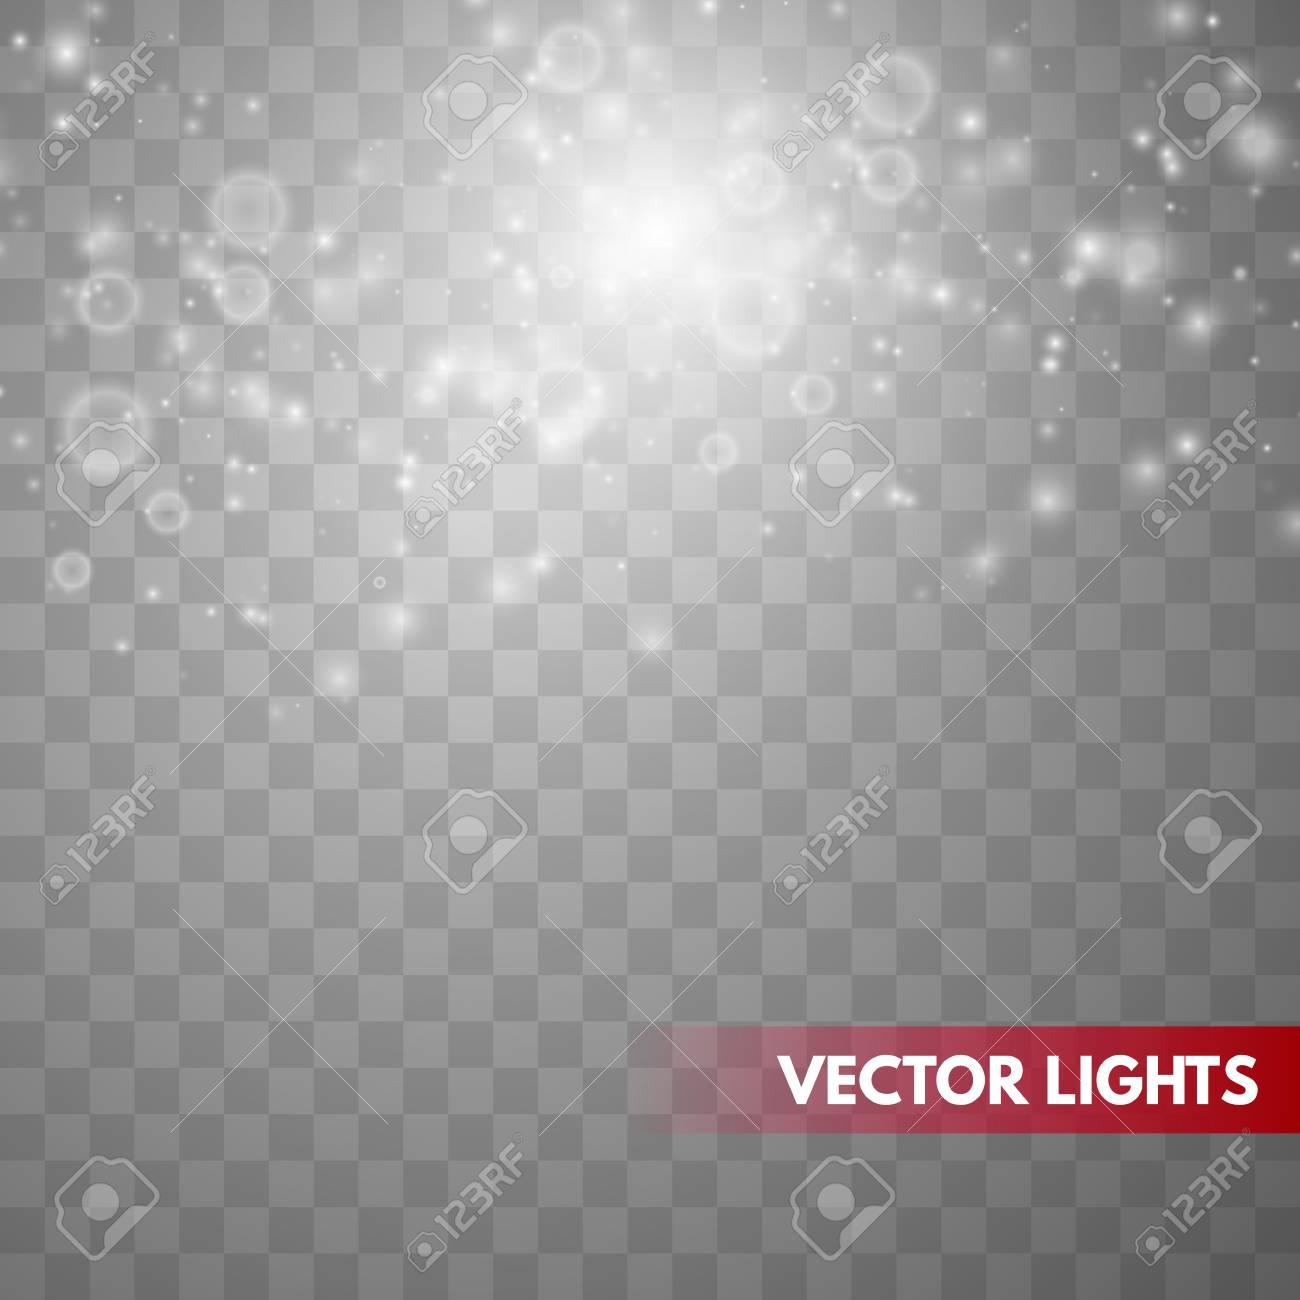 Glow light effect. Sparkle dust. Christmas flash. Vector illustration - 121025913